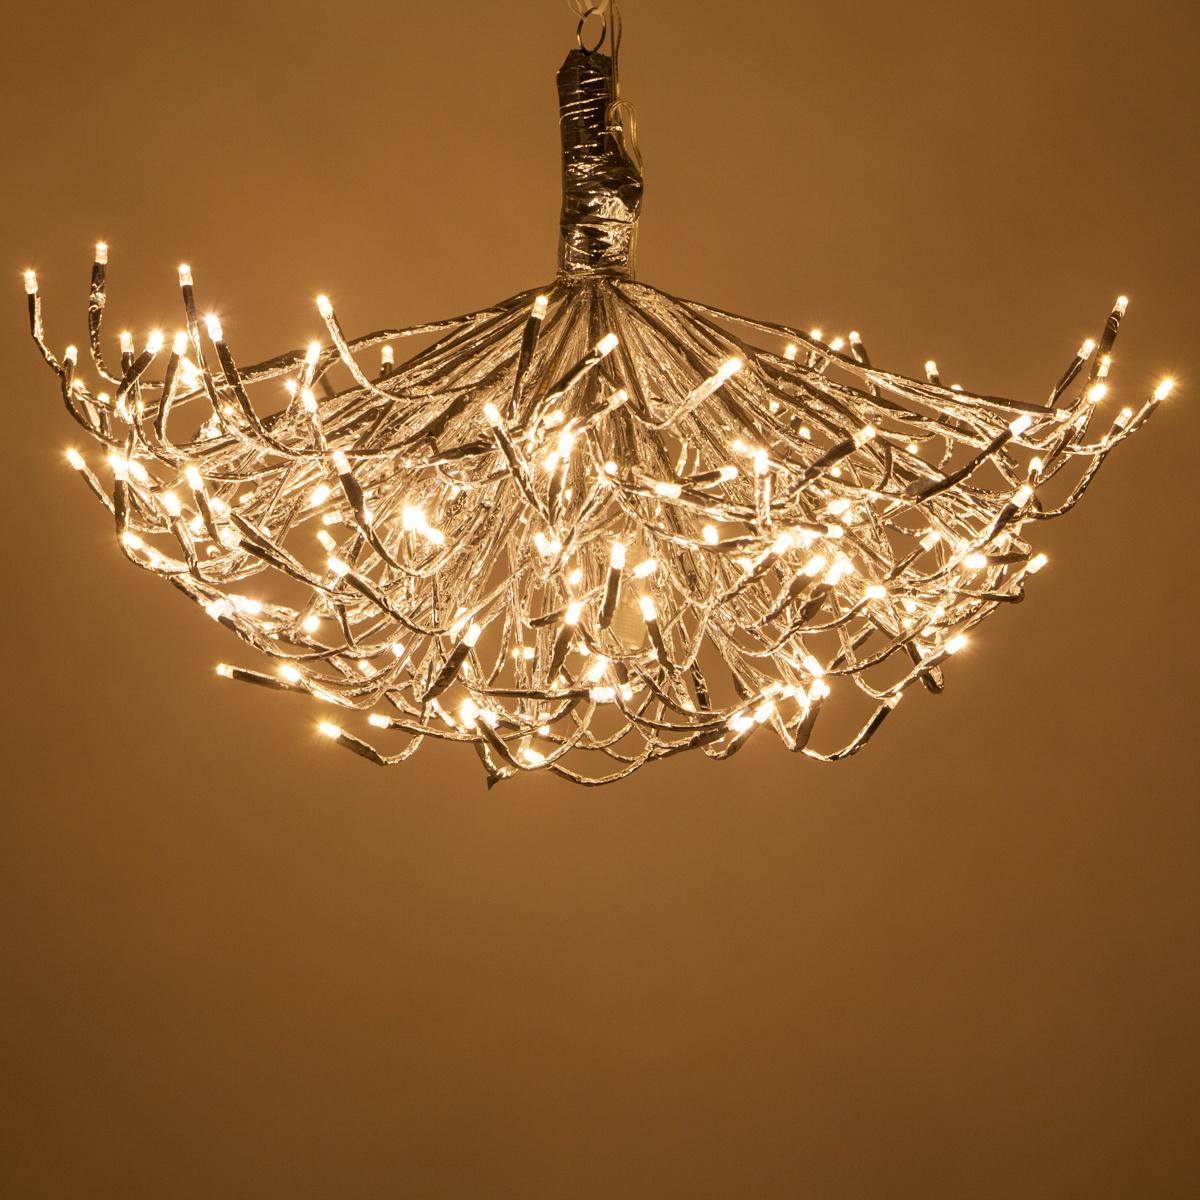 Undecorated DIY Starburst  Lighted Branches Chandelier